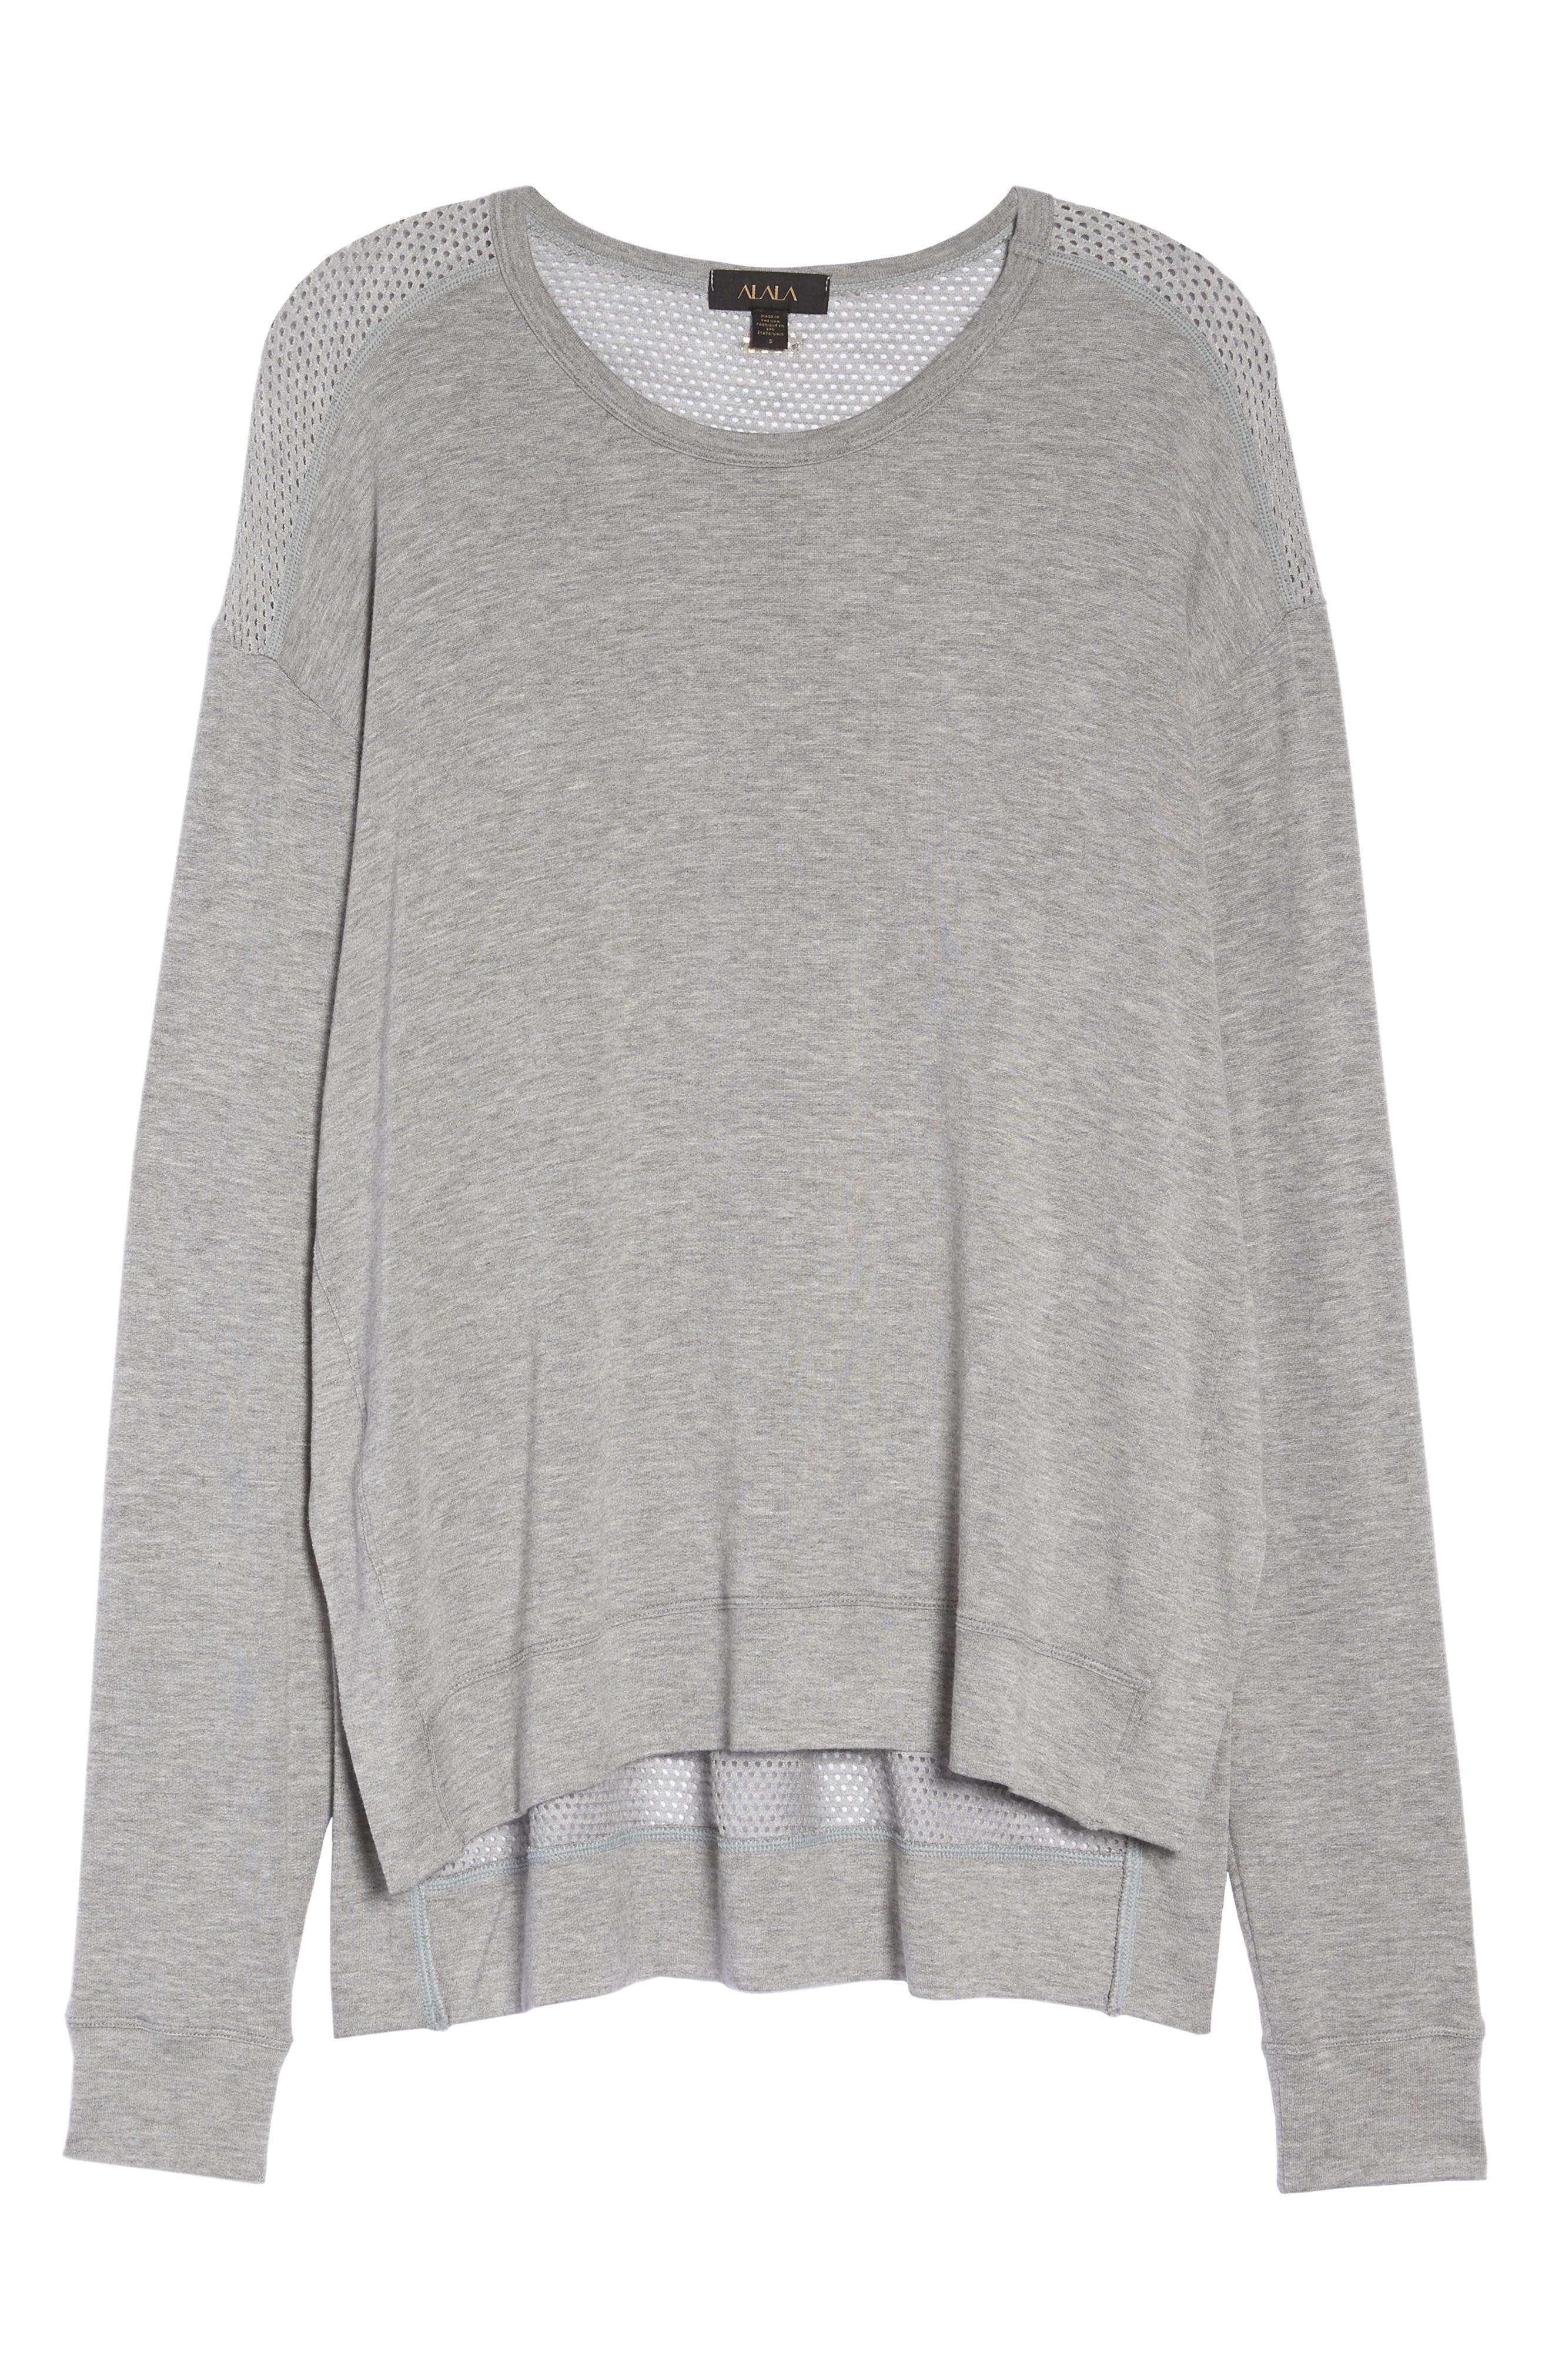 Heron Mesh Back Sweatshirt,                             Alternate thumbnail 7, color,                             HEATHER GREY